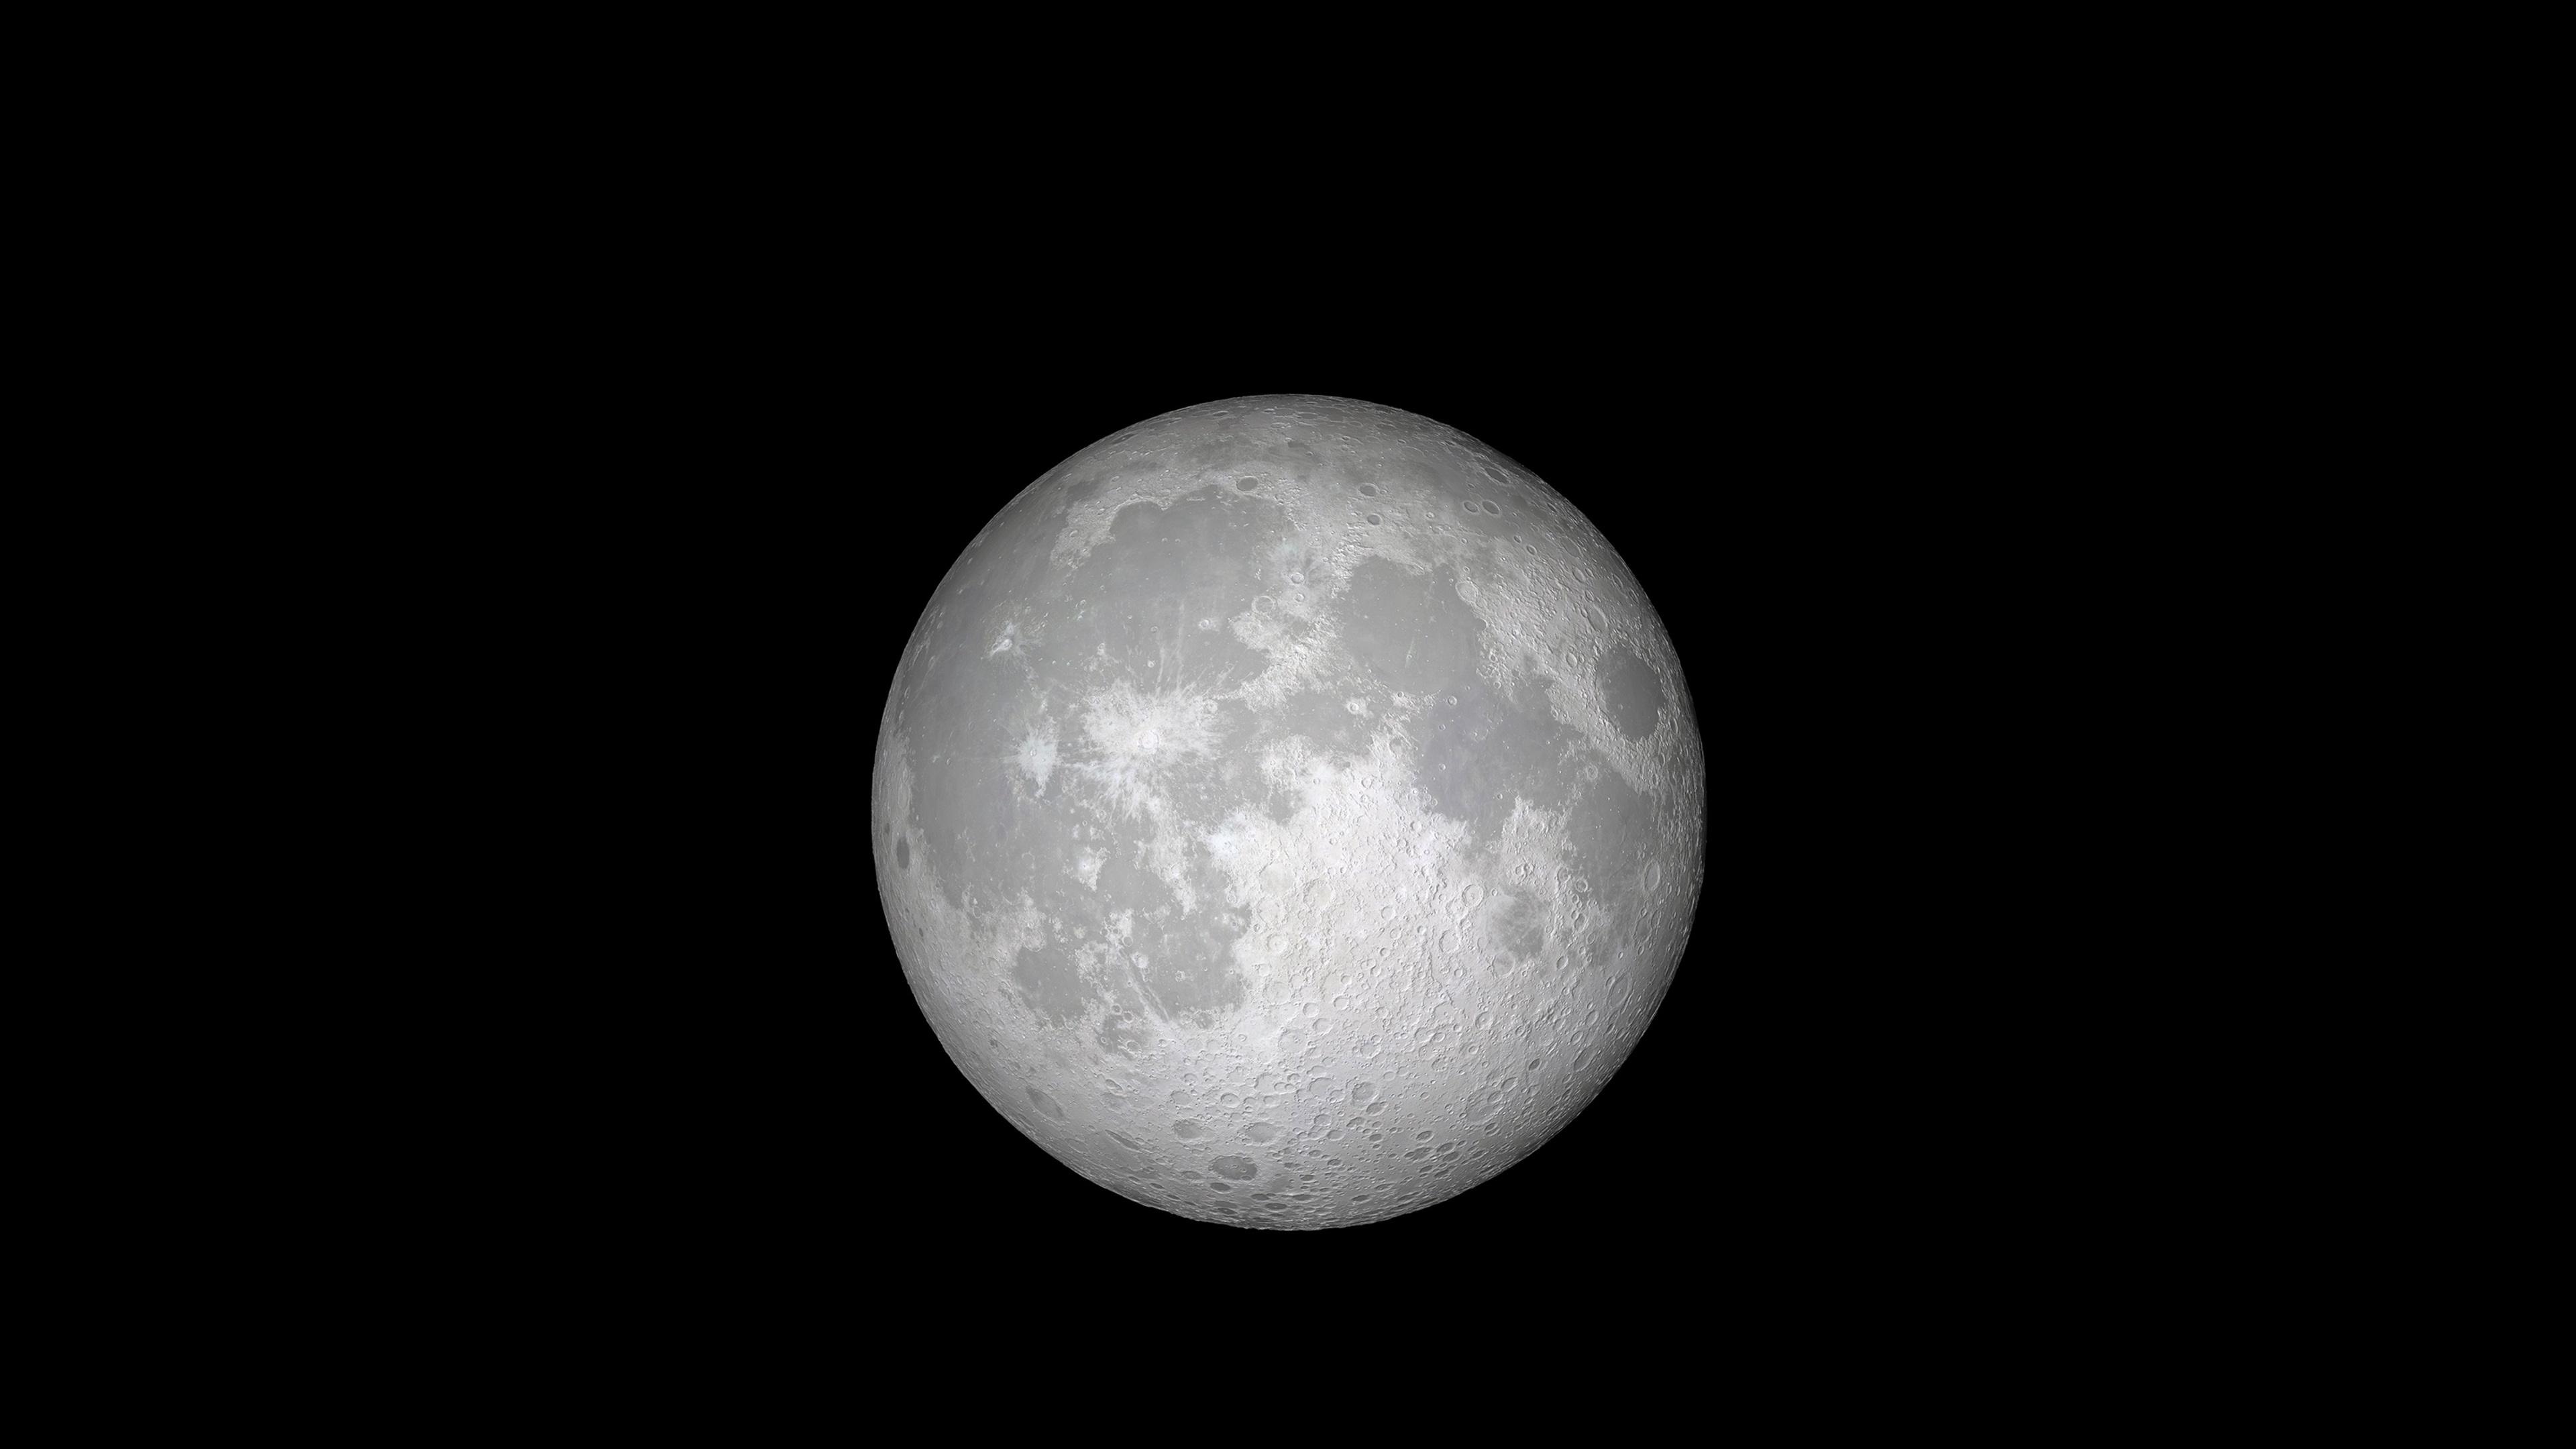 The full moon 🌕 wallpaper